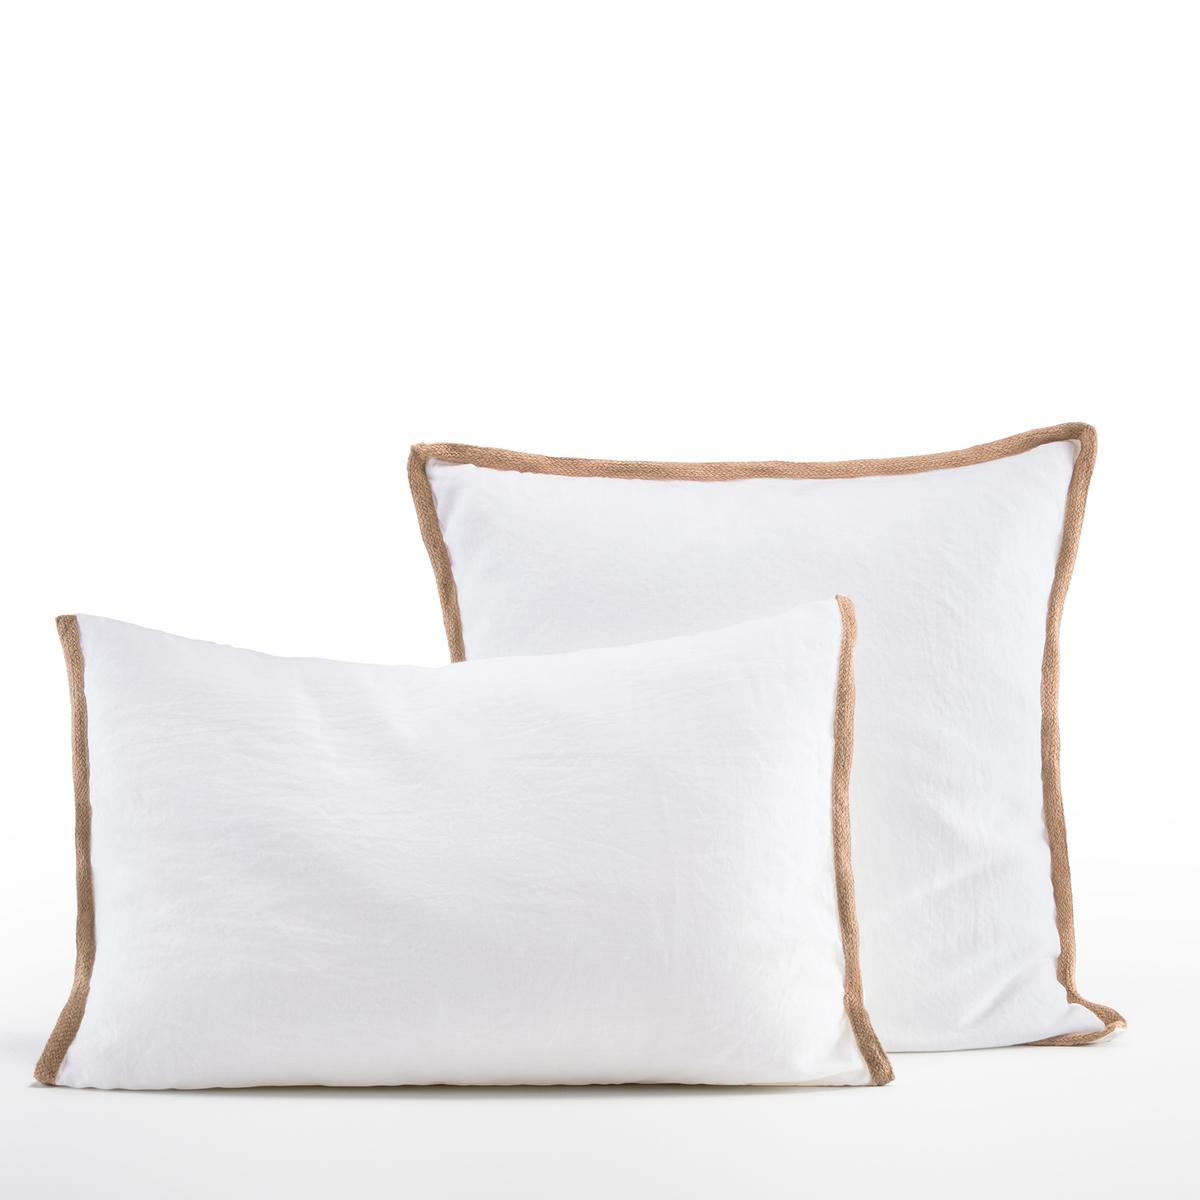 Наволочка La Redoute Из льна Celini 65 x 65 см белый чехол la redoute для подушки или наволочка однотонного цвета с помпонами riad 65 x 65 см розовый